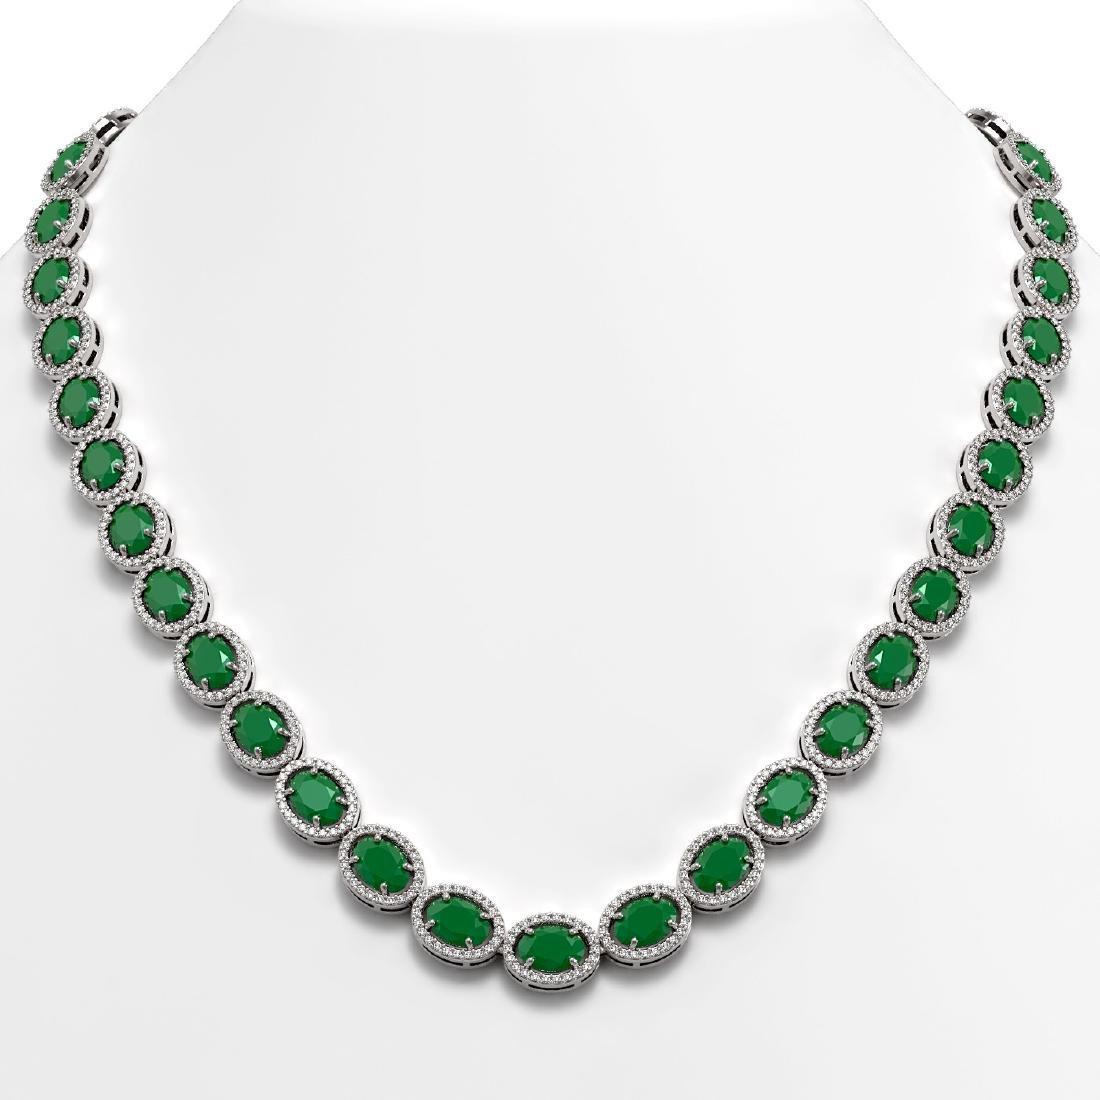 52.15 CTW Emerald & Diamond Halo Necklace 10K White